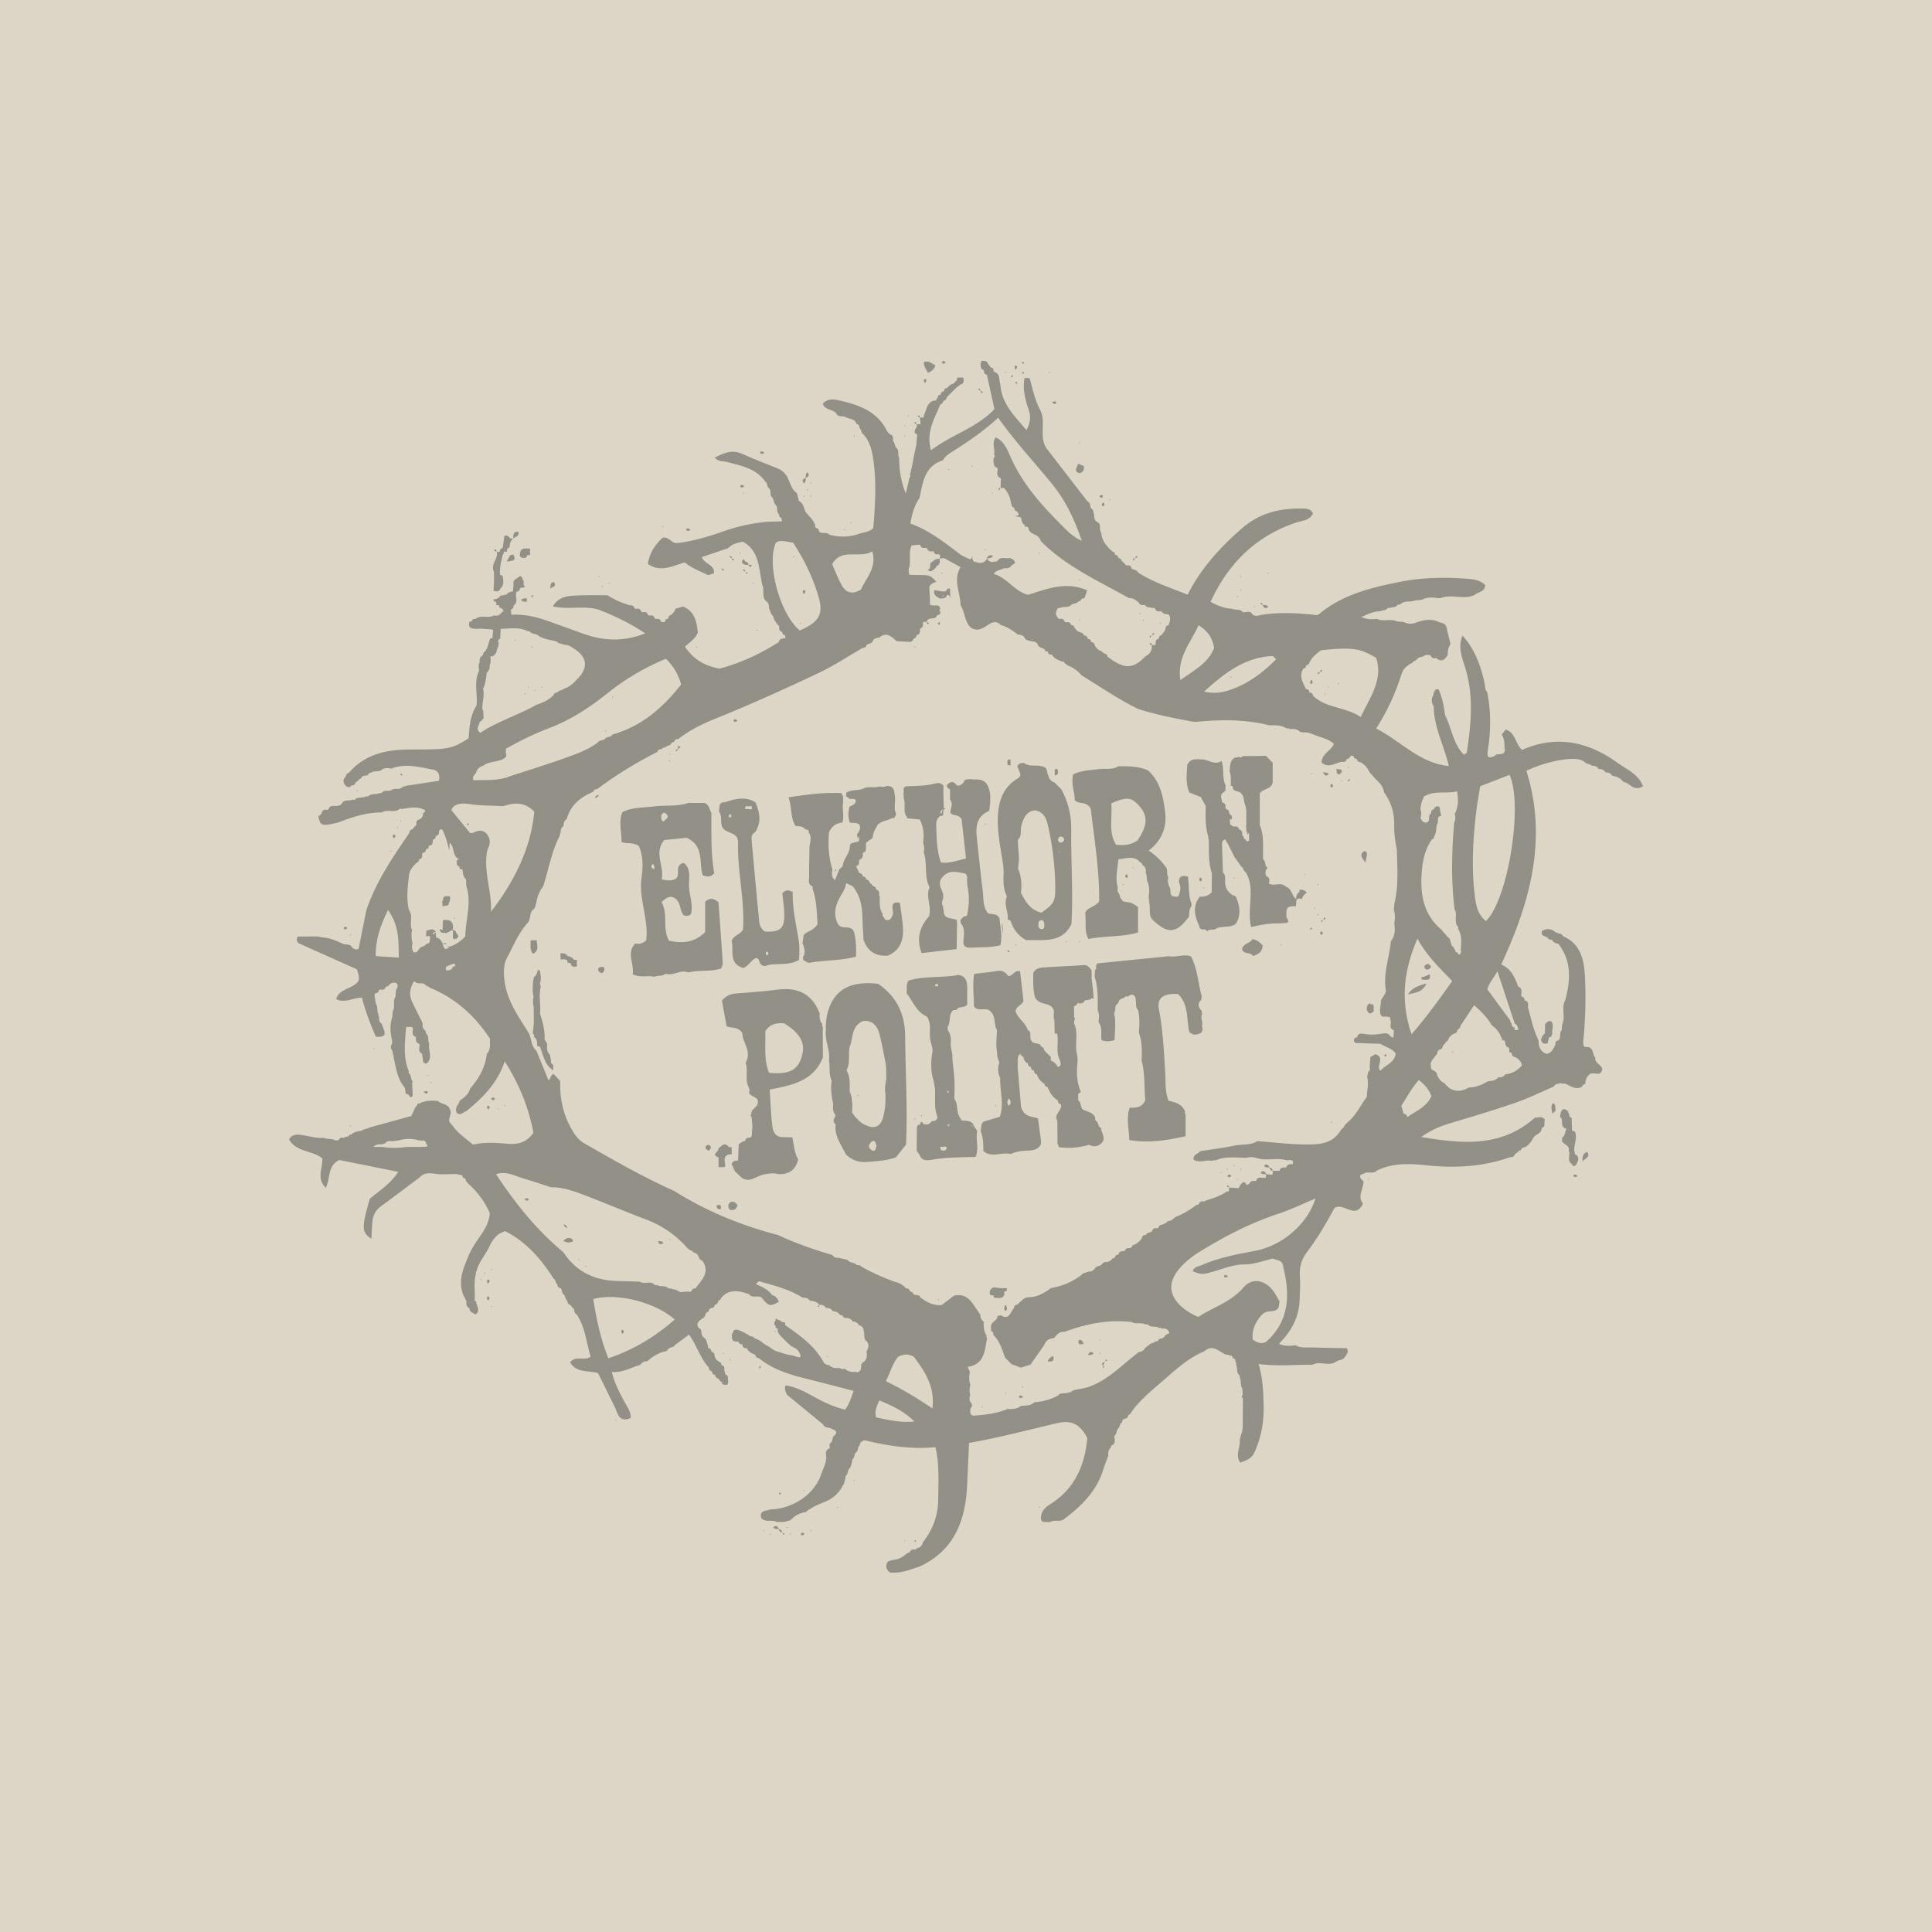 logos_0005_elkhorn_point.jpg